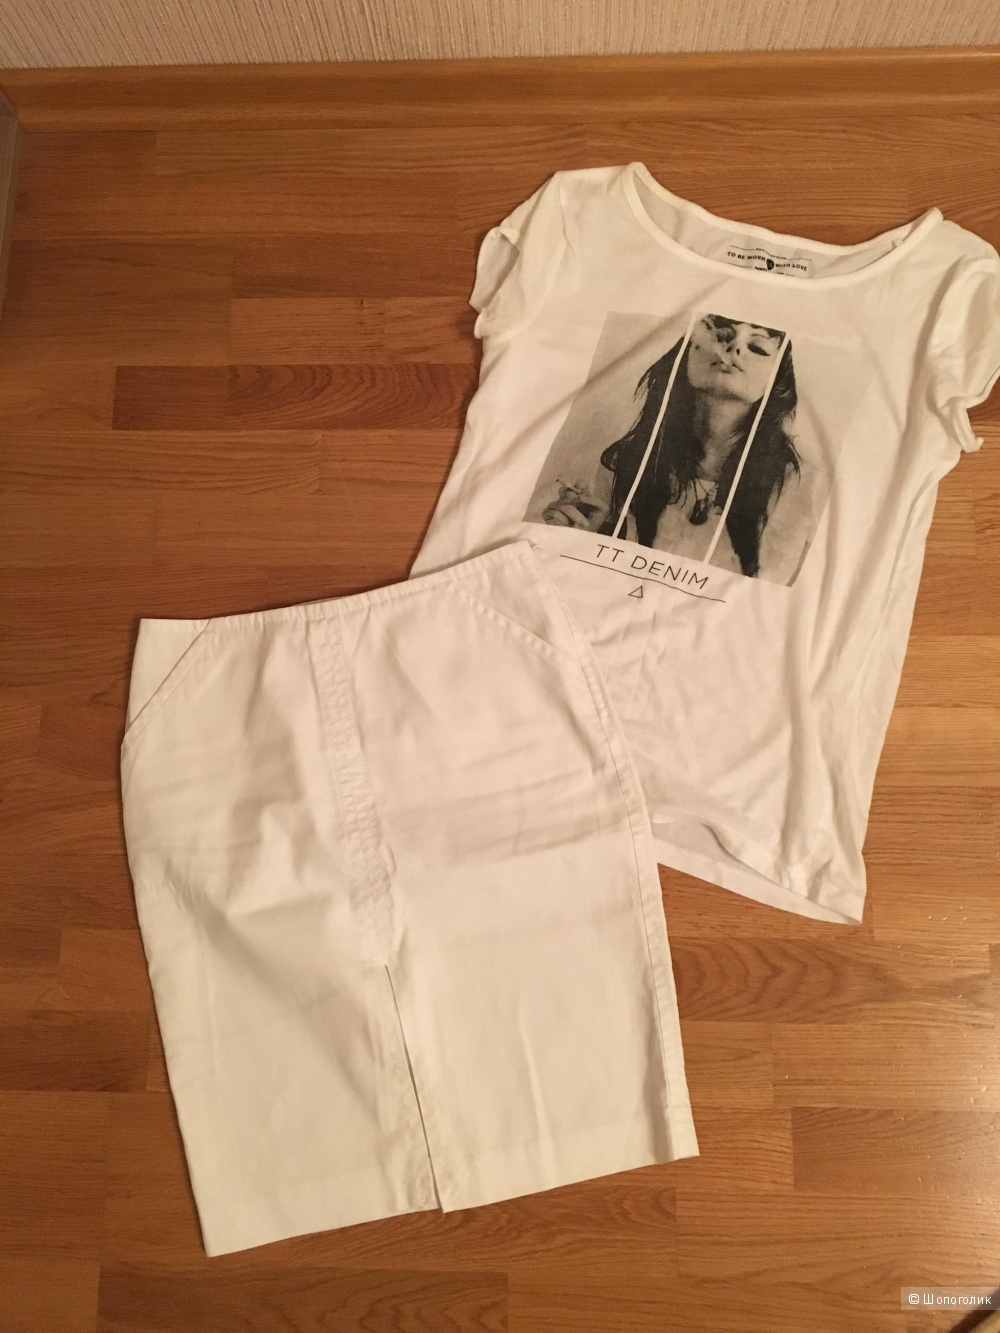 Сет из юбки с топом xs